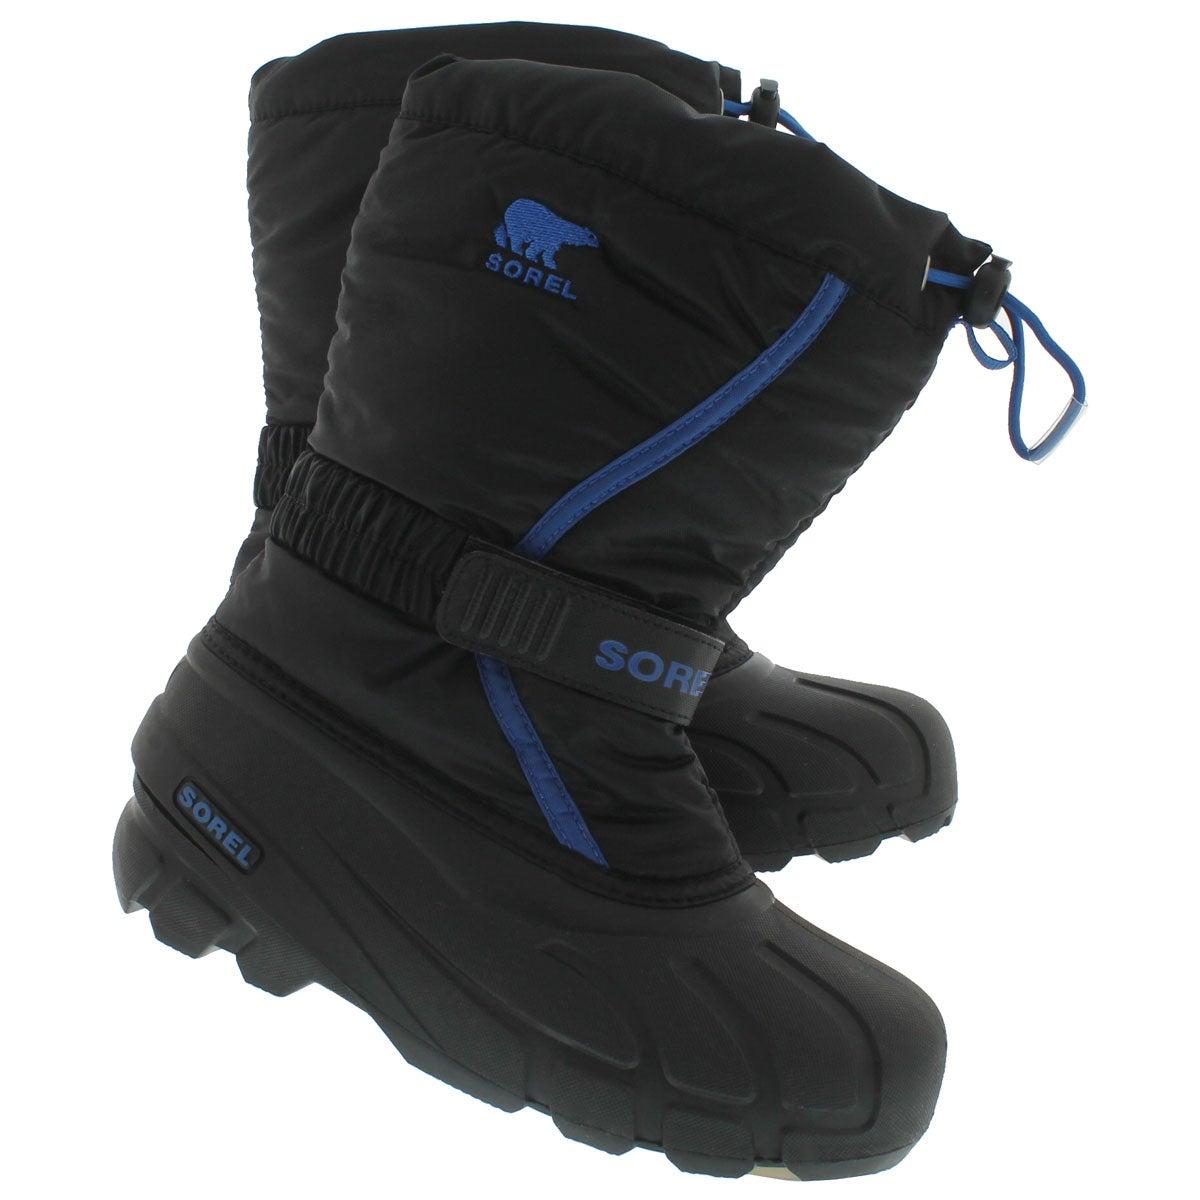 sorel snow boots black friday national sheriffs association